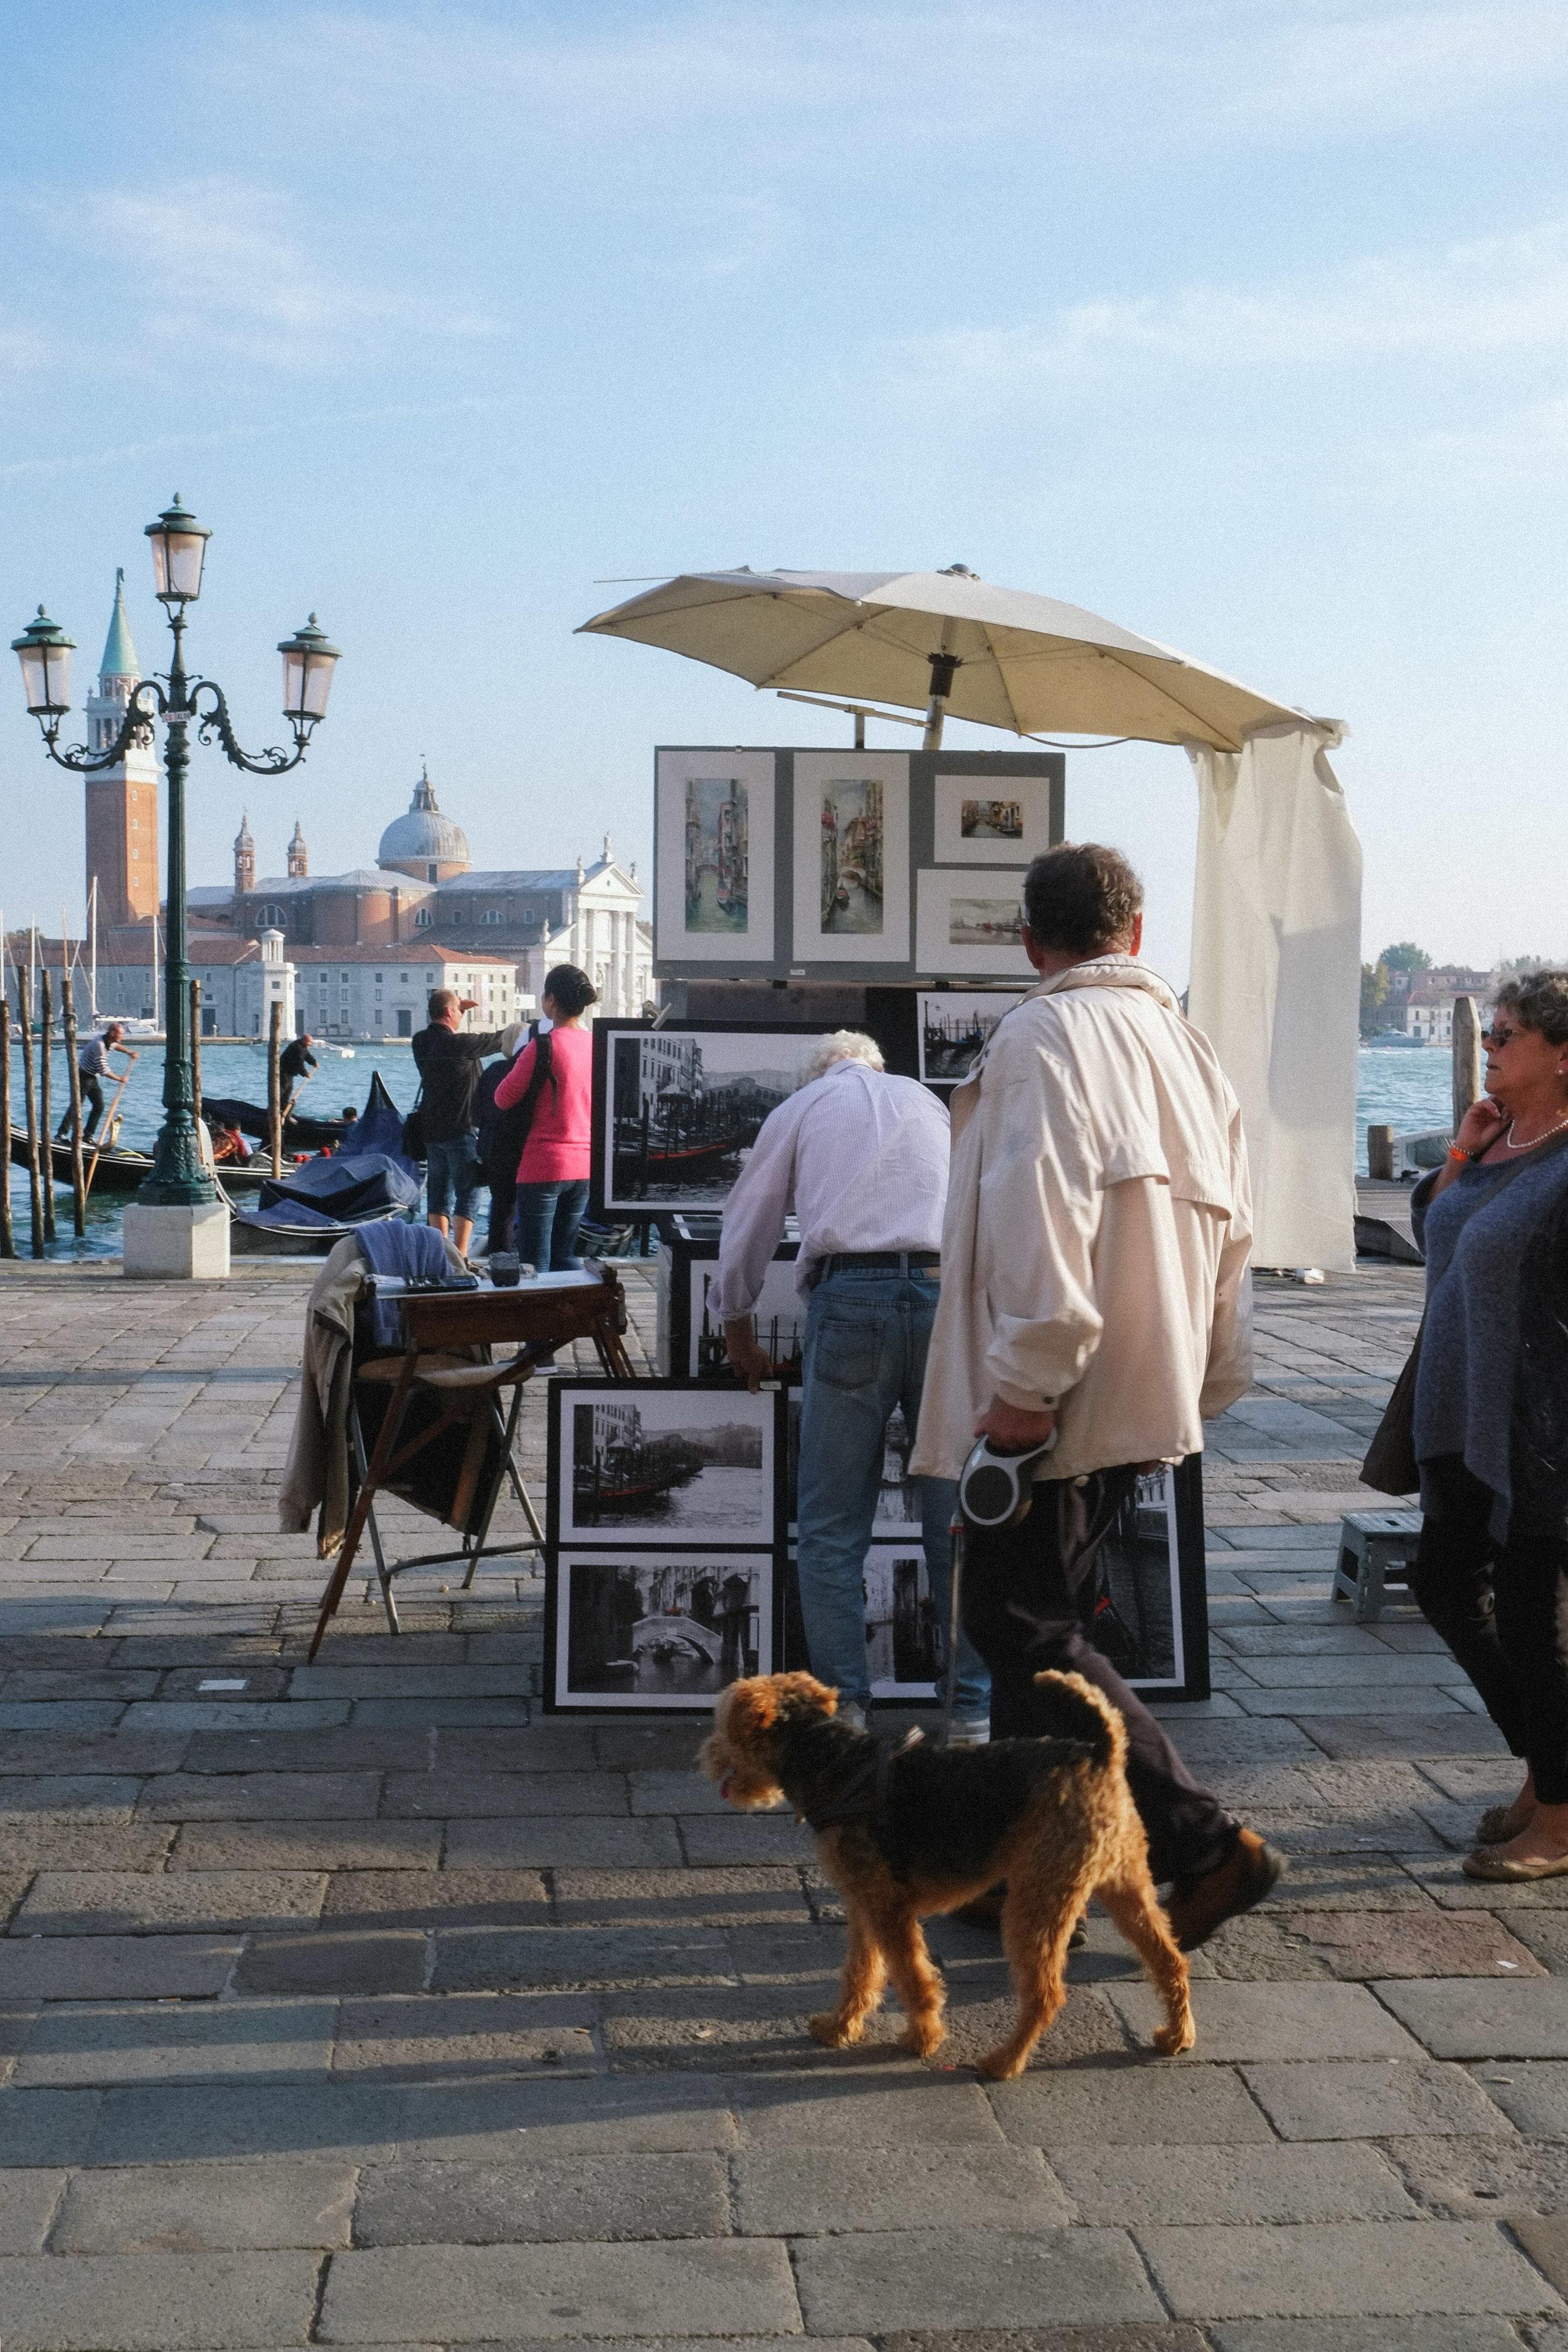 Lesly Lotha_Venice_Italy 05.jpg